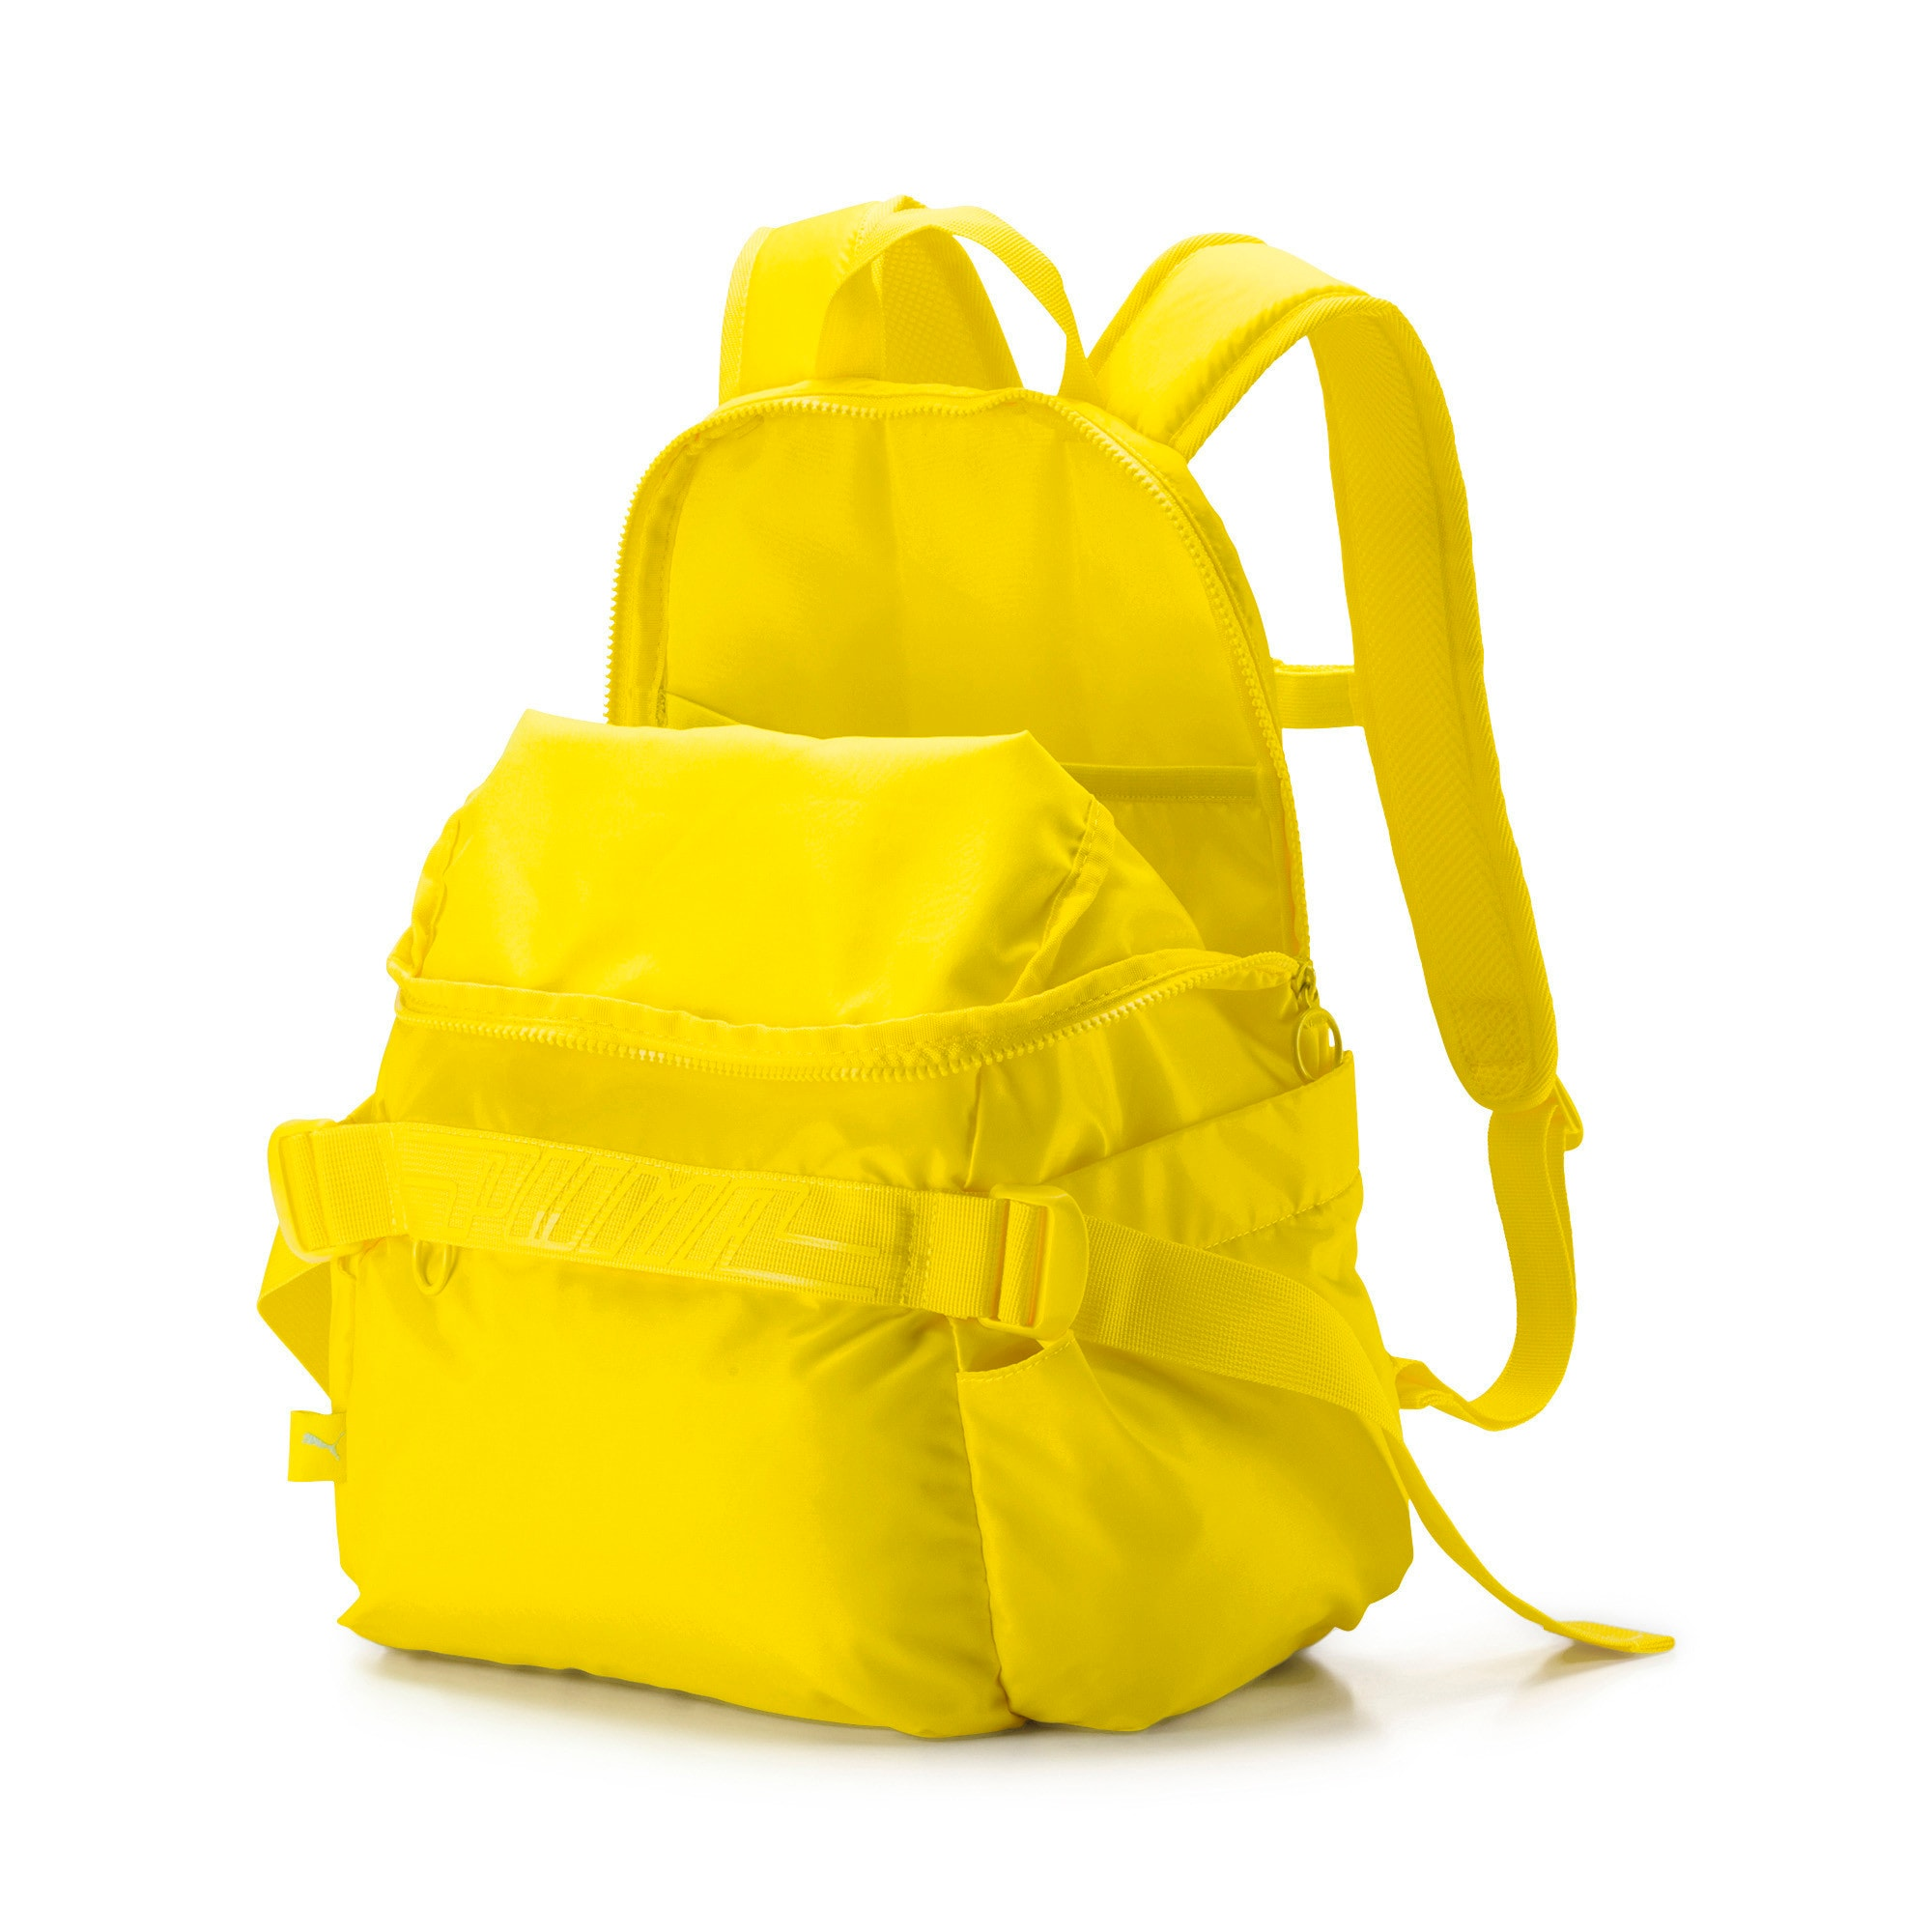 Thumbnail 4 of Cosmic Women's Training Backpack, Blazing Yellow, medium